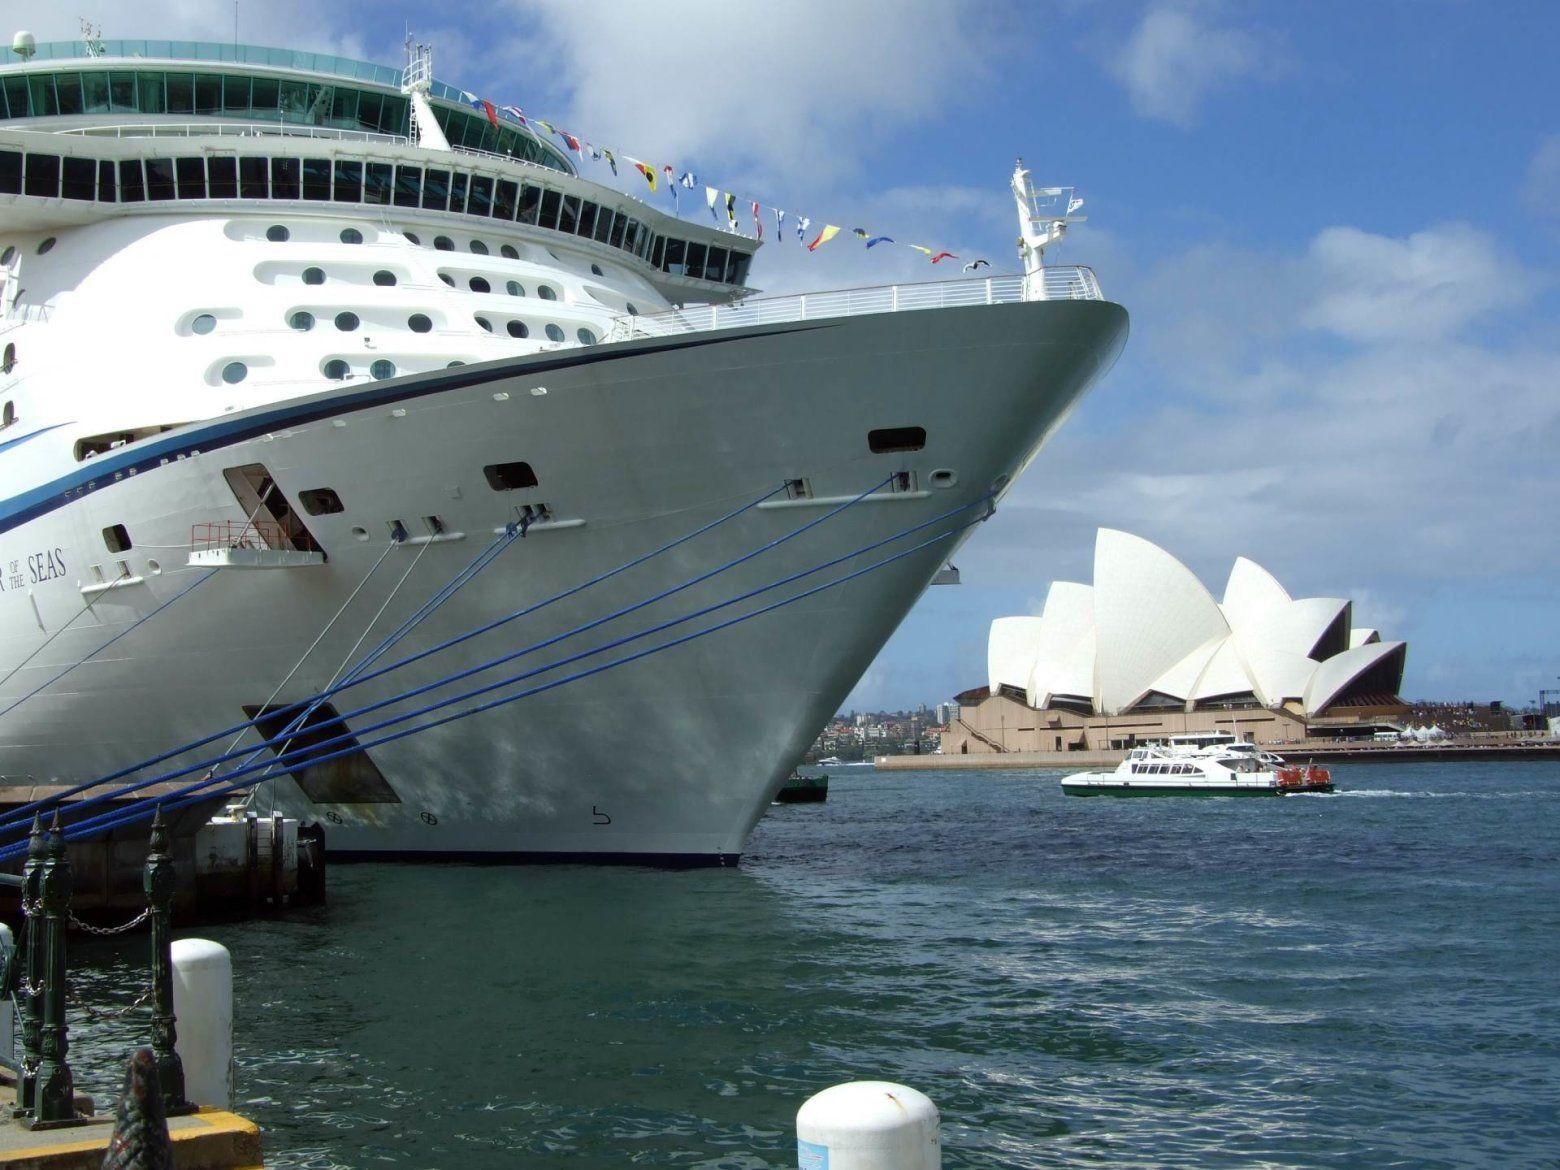 Cruiser and Opera House, Harbor Bridge, Cruise, Boat, Cruising,Background, Wallpapers